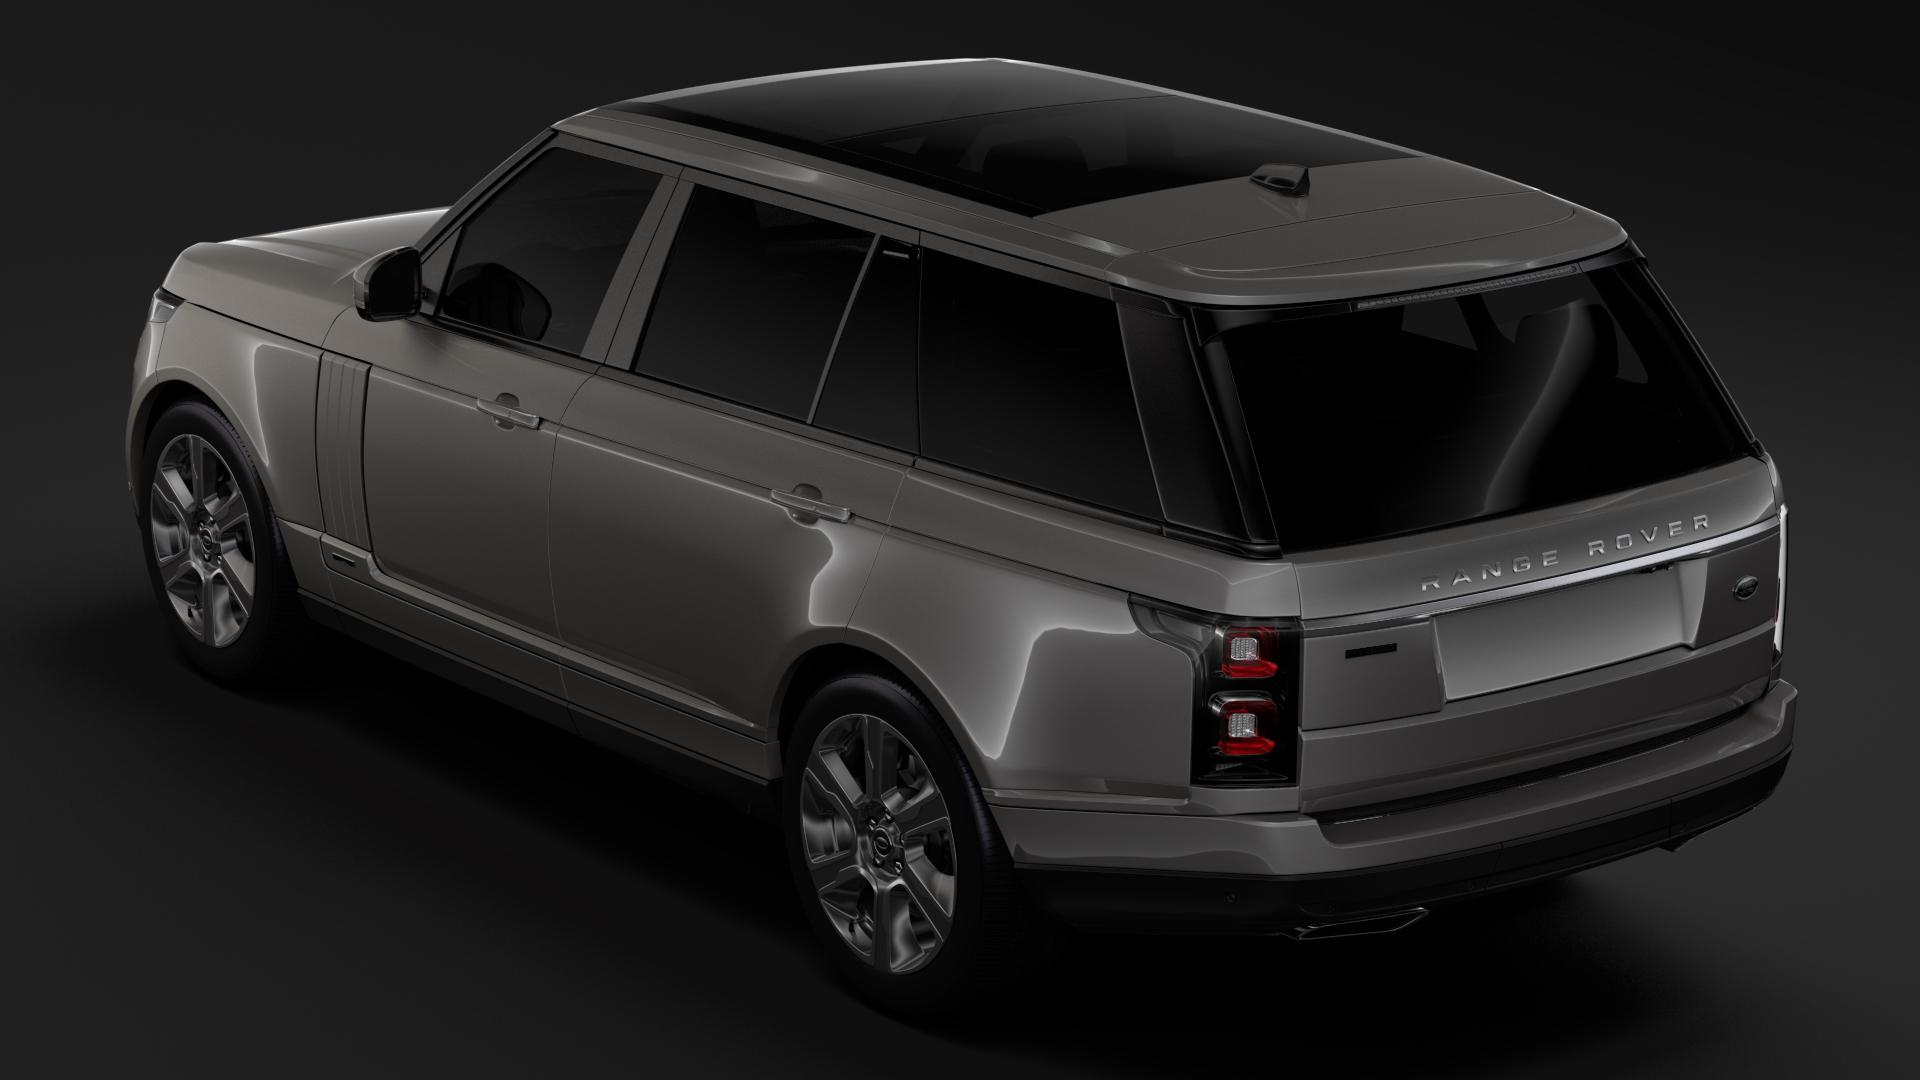 range rover hybrid lwb l405 2018 3d model max fbx c4d lwo ma mb hrc xsi obj 277422